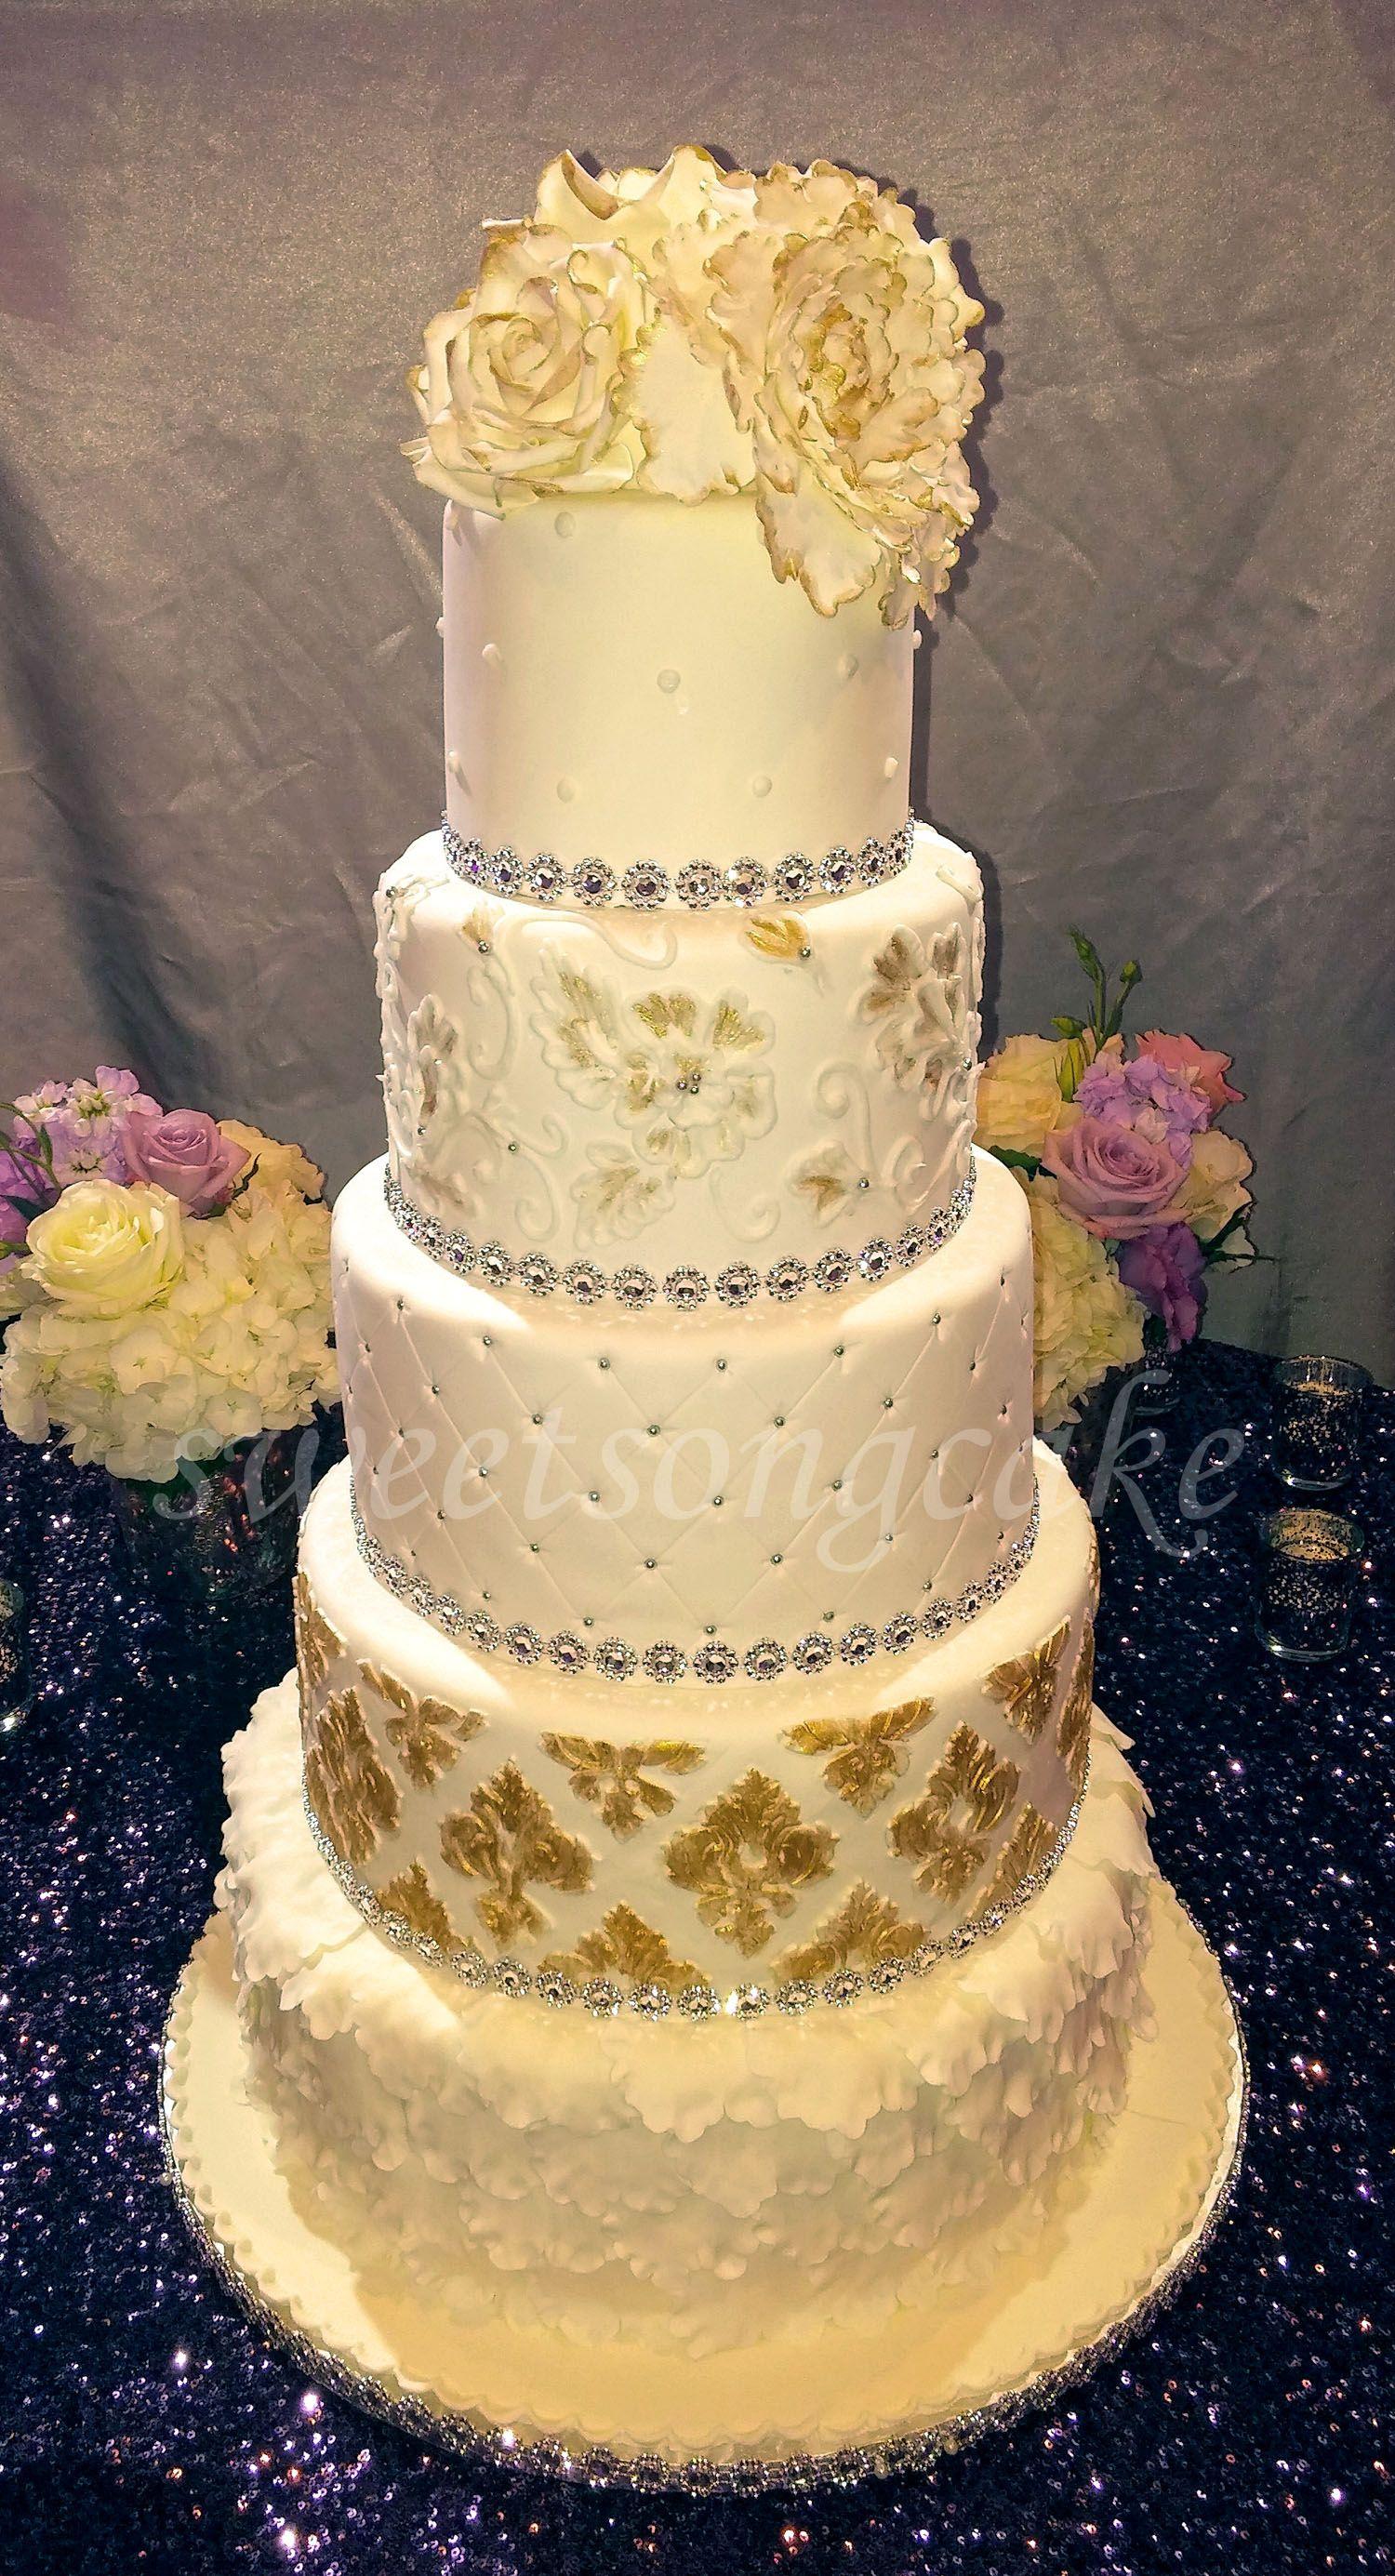 5 tiers wedding cake White, Silver and Gold decor | Ottawa Wedding ...